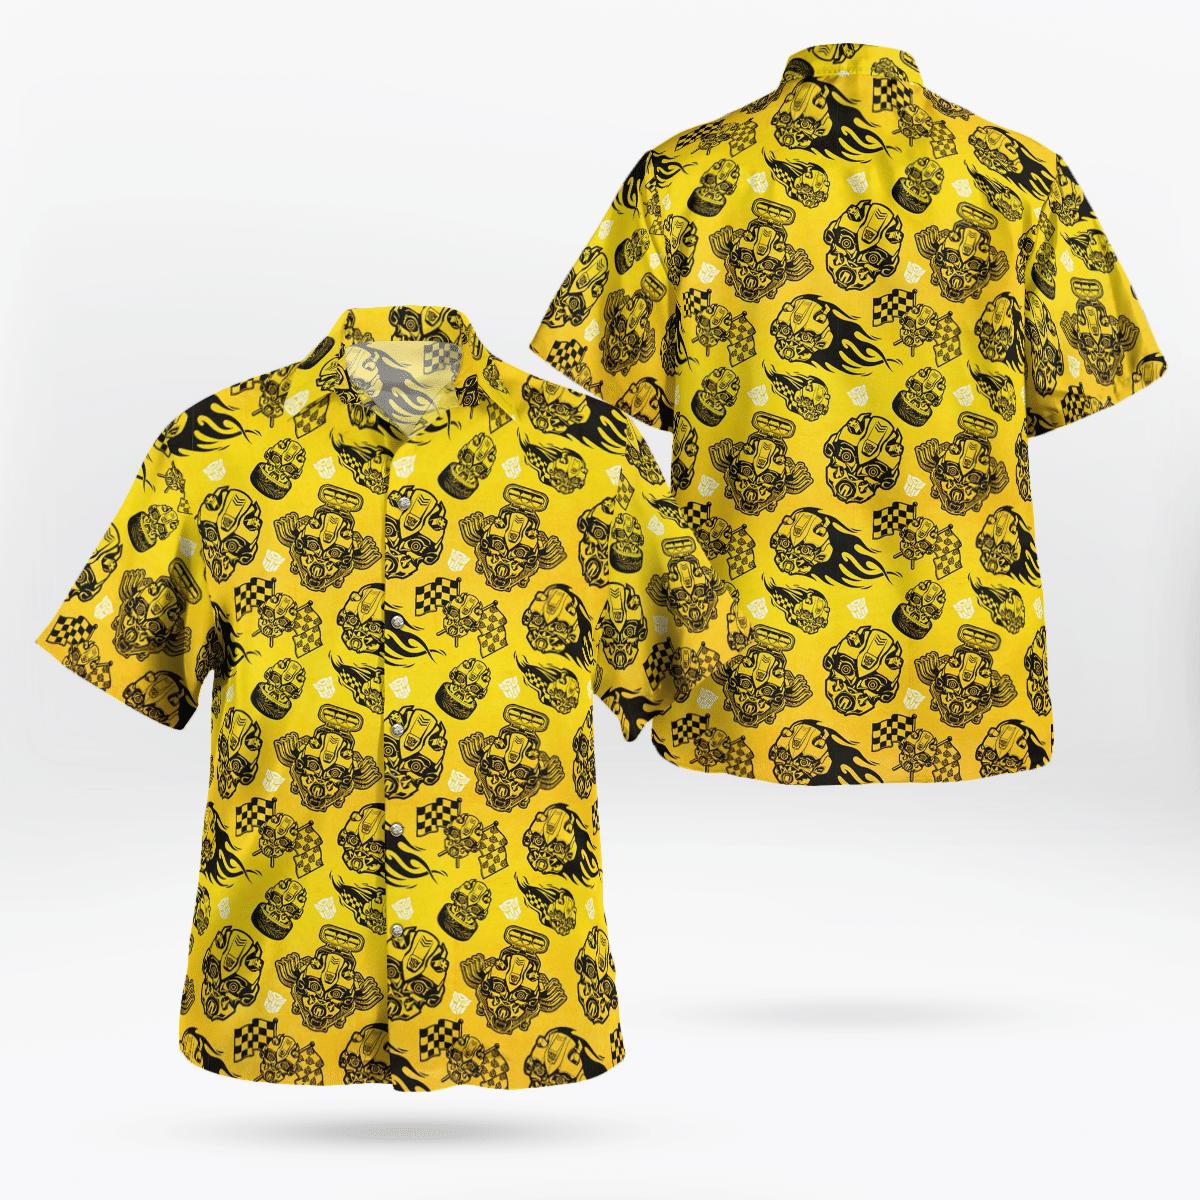 Transformers Bumblebee pattern Hawaiian Shirt Summer Shirt